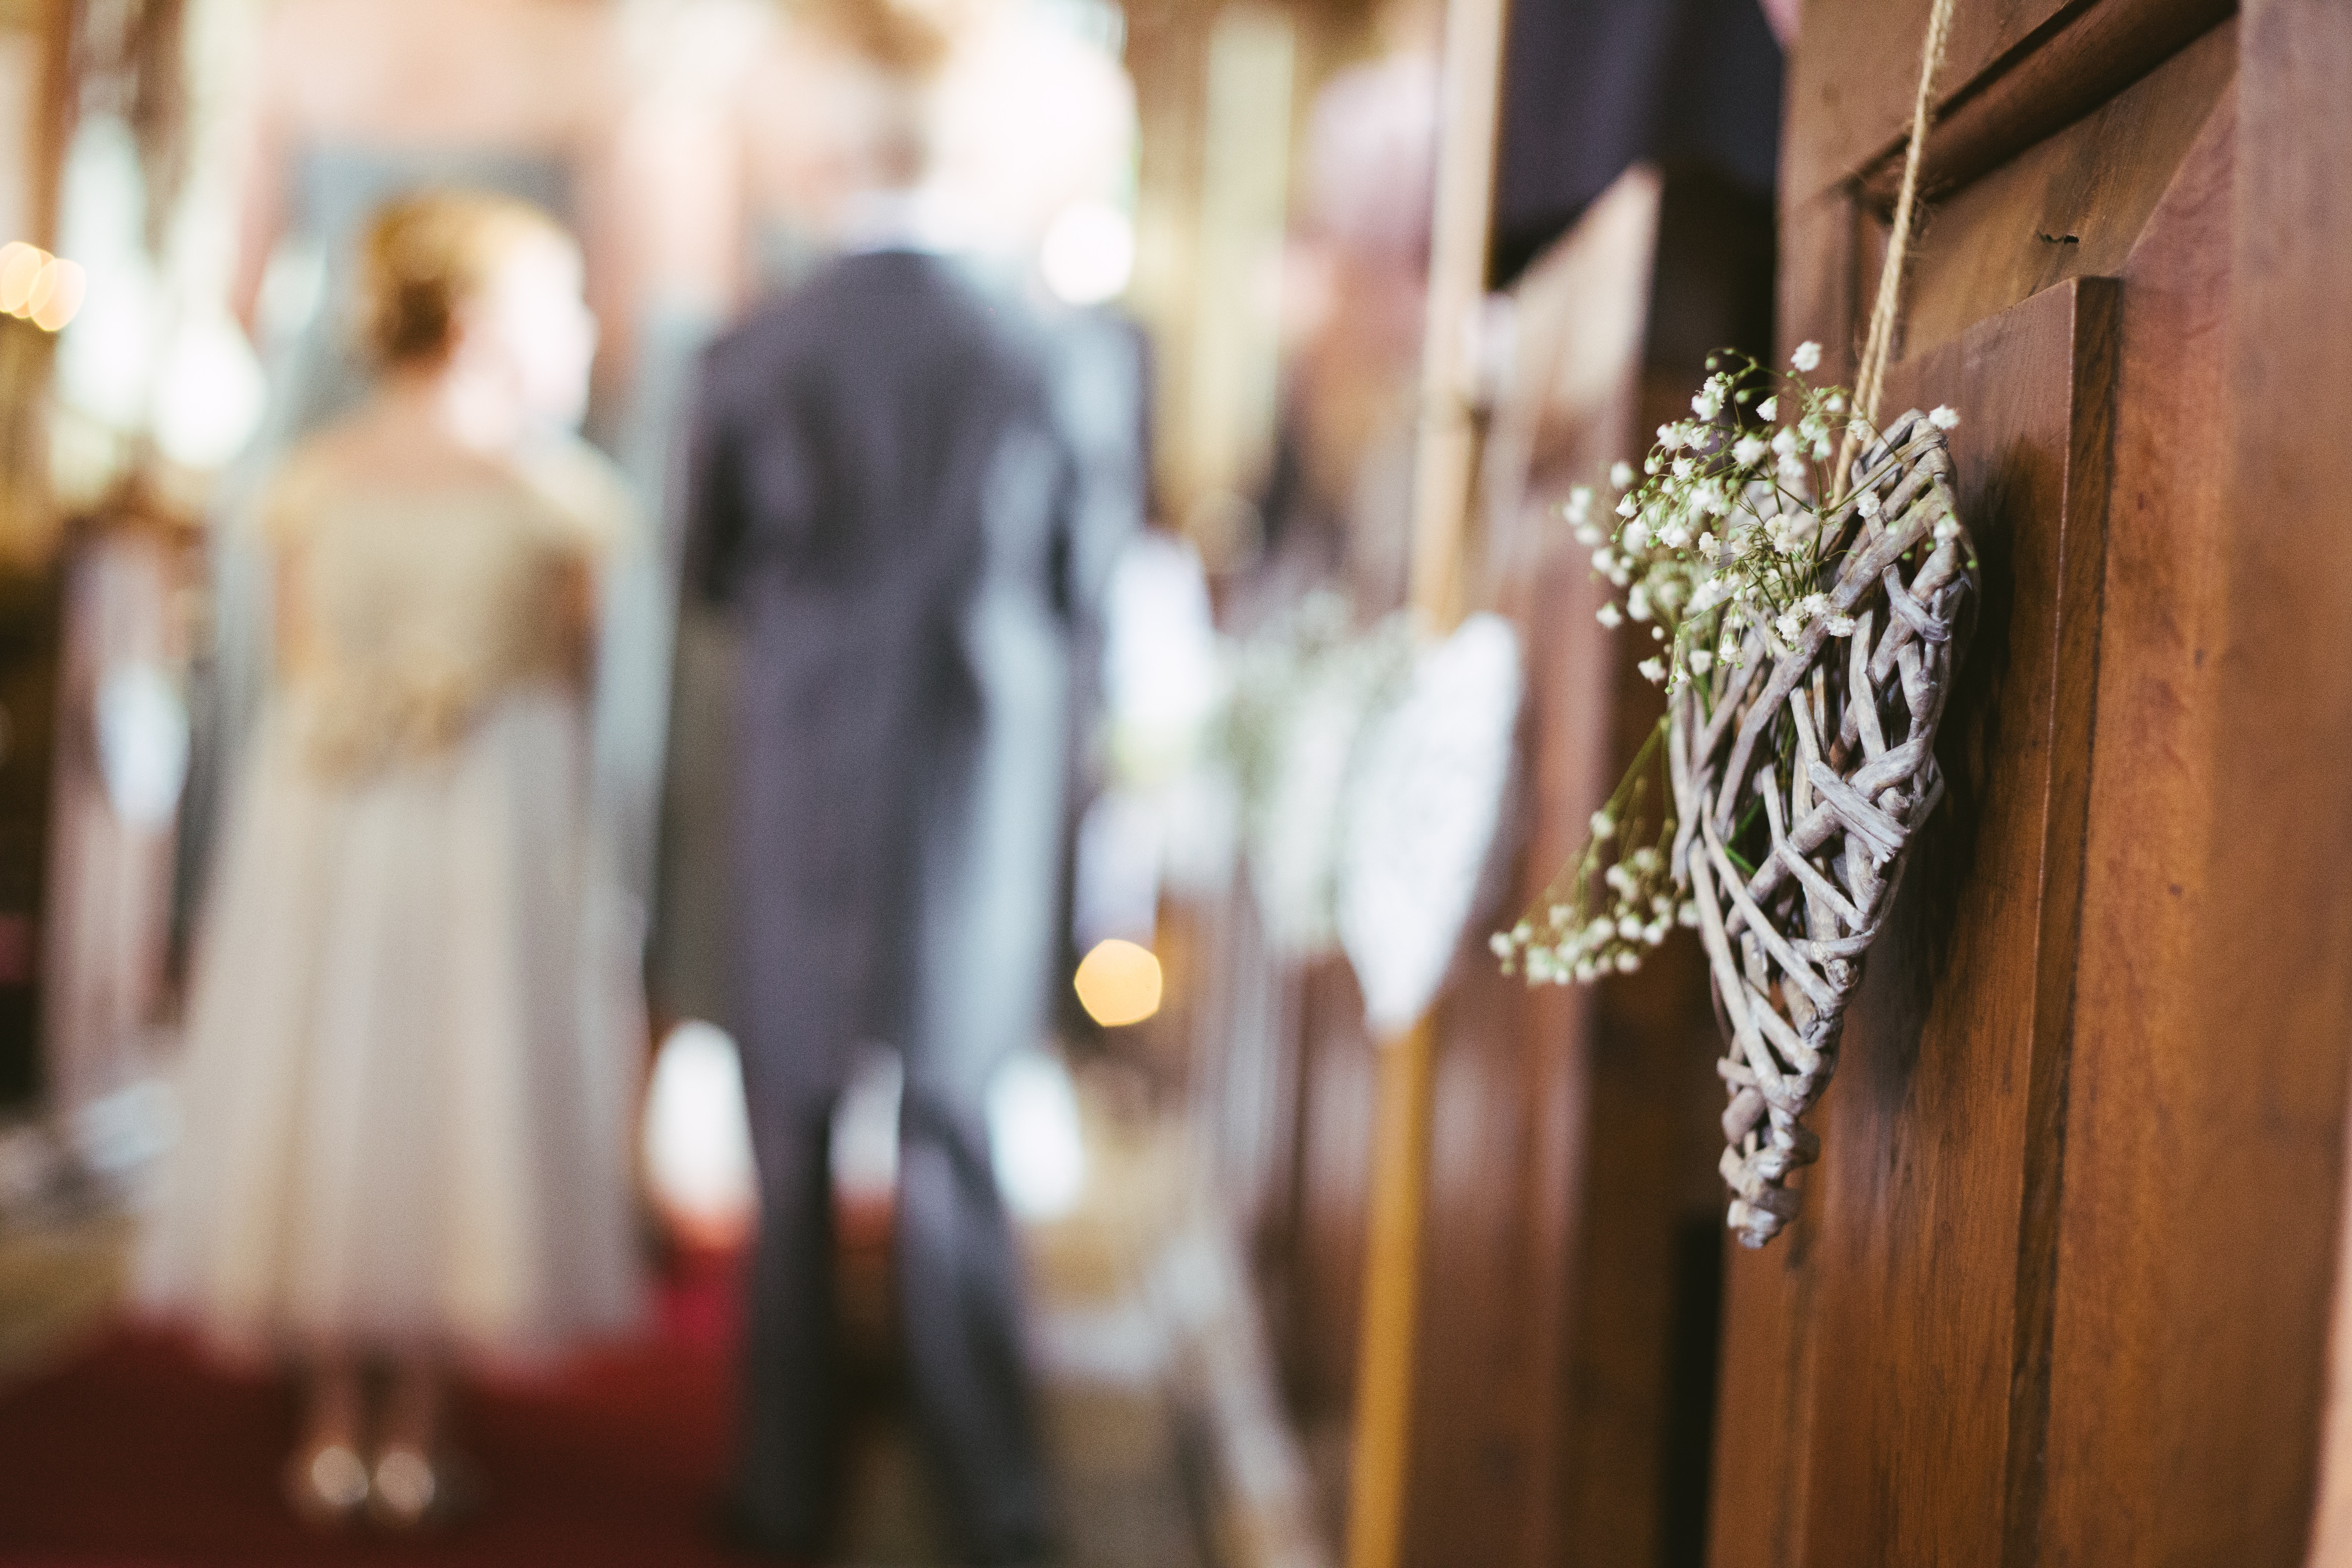 Photo of a wedding by James Bold on Unsplash